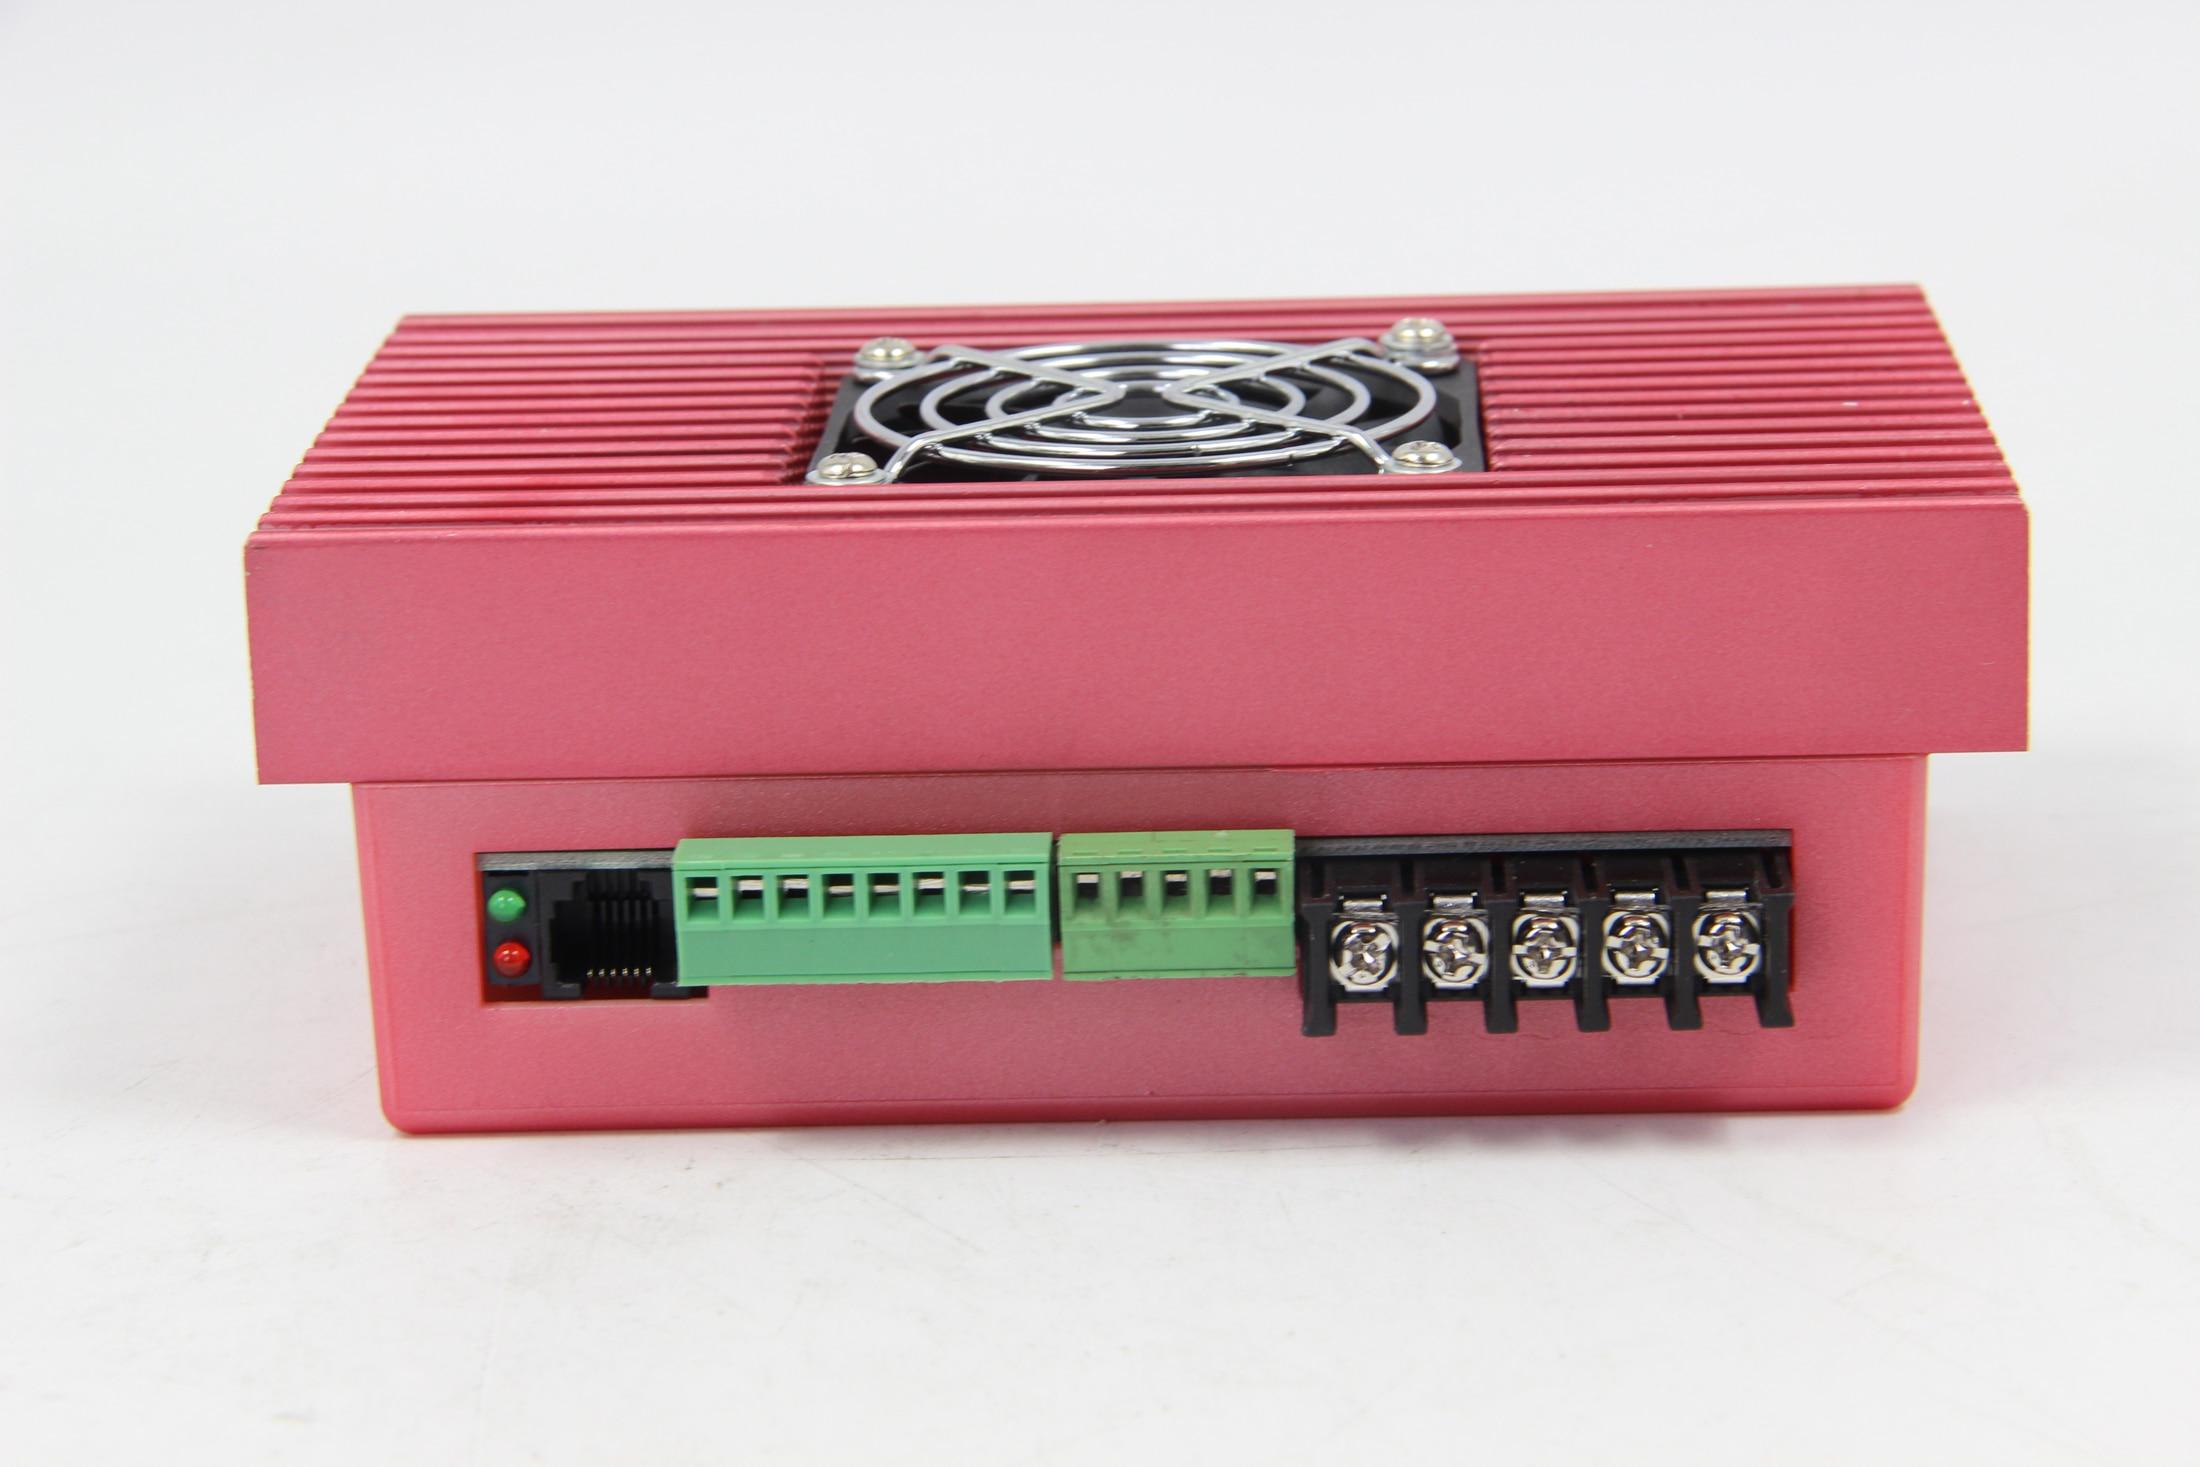 DC Brushless Motor Driver ZM-7205A Controller with Handheld Intelligent Debugger